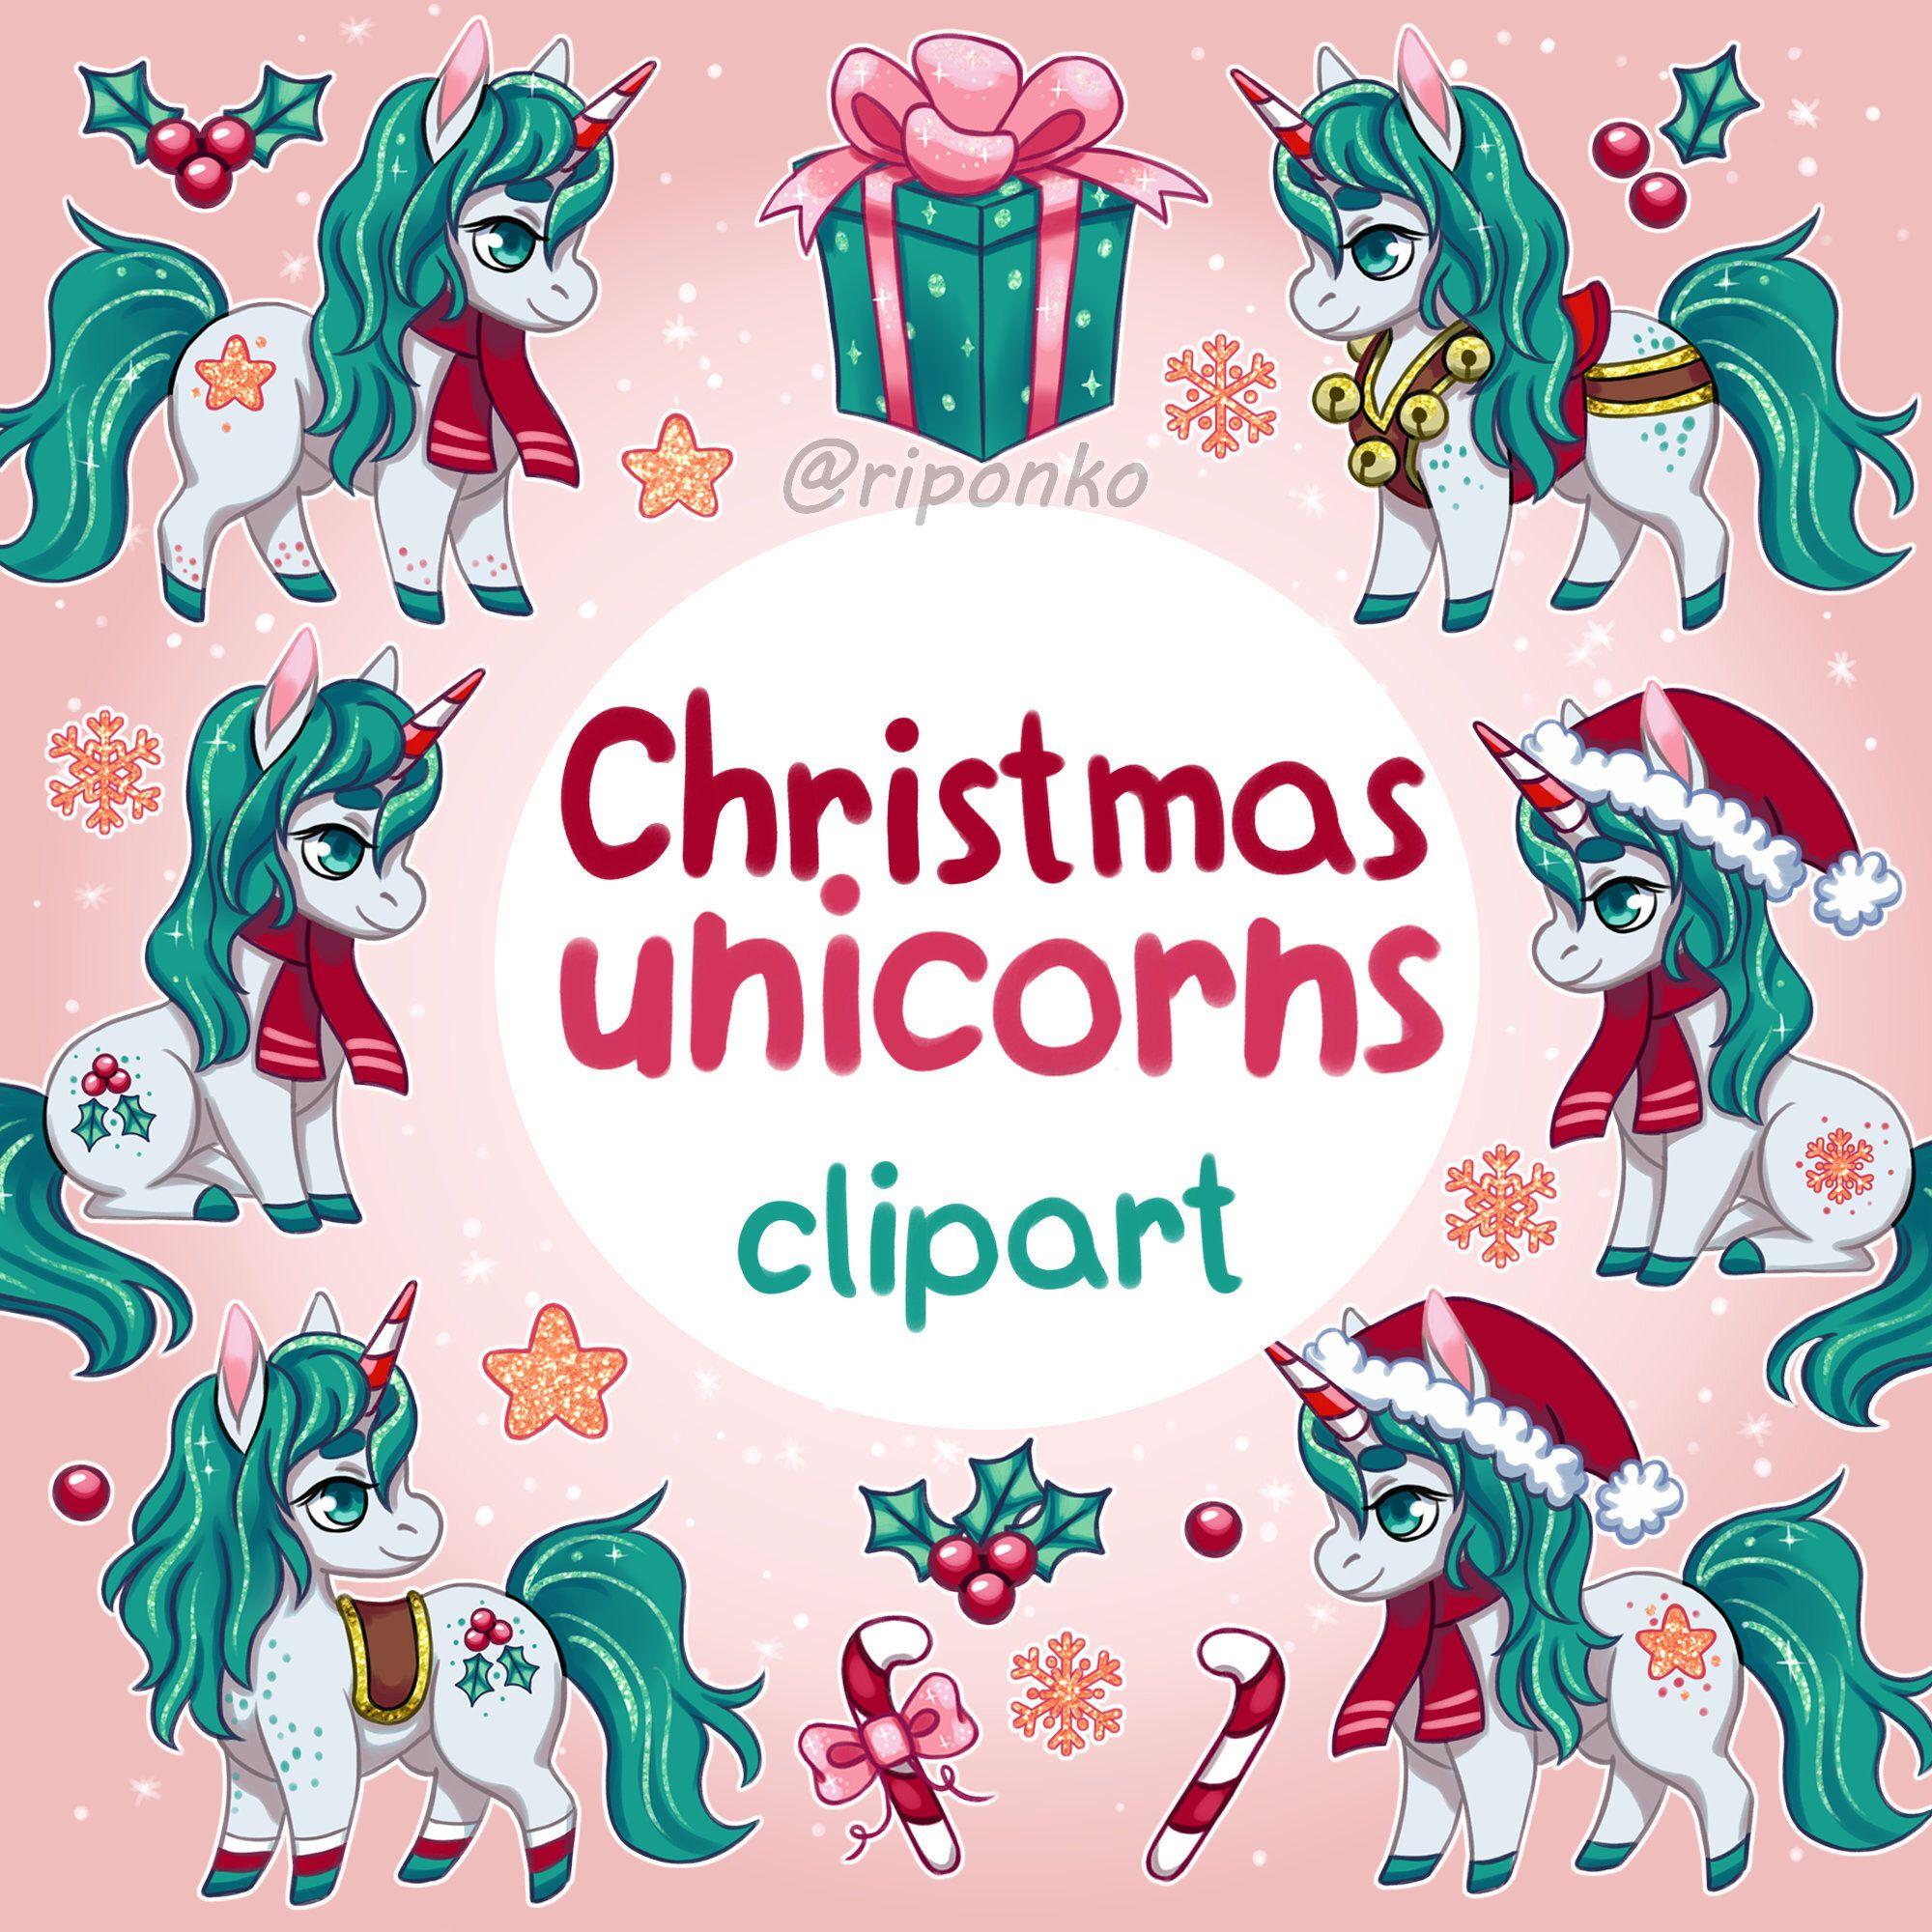 Christmas Unicorn clipart, Christmas clipart, Winter ... (2000 x 2000 Pixel)